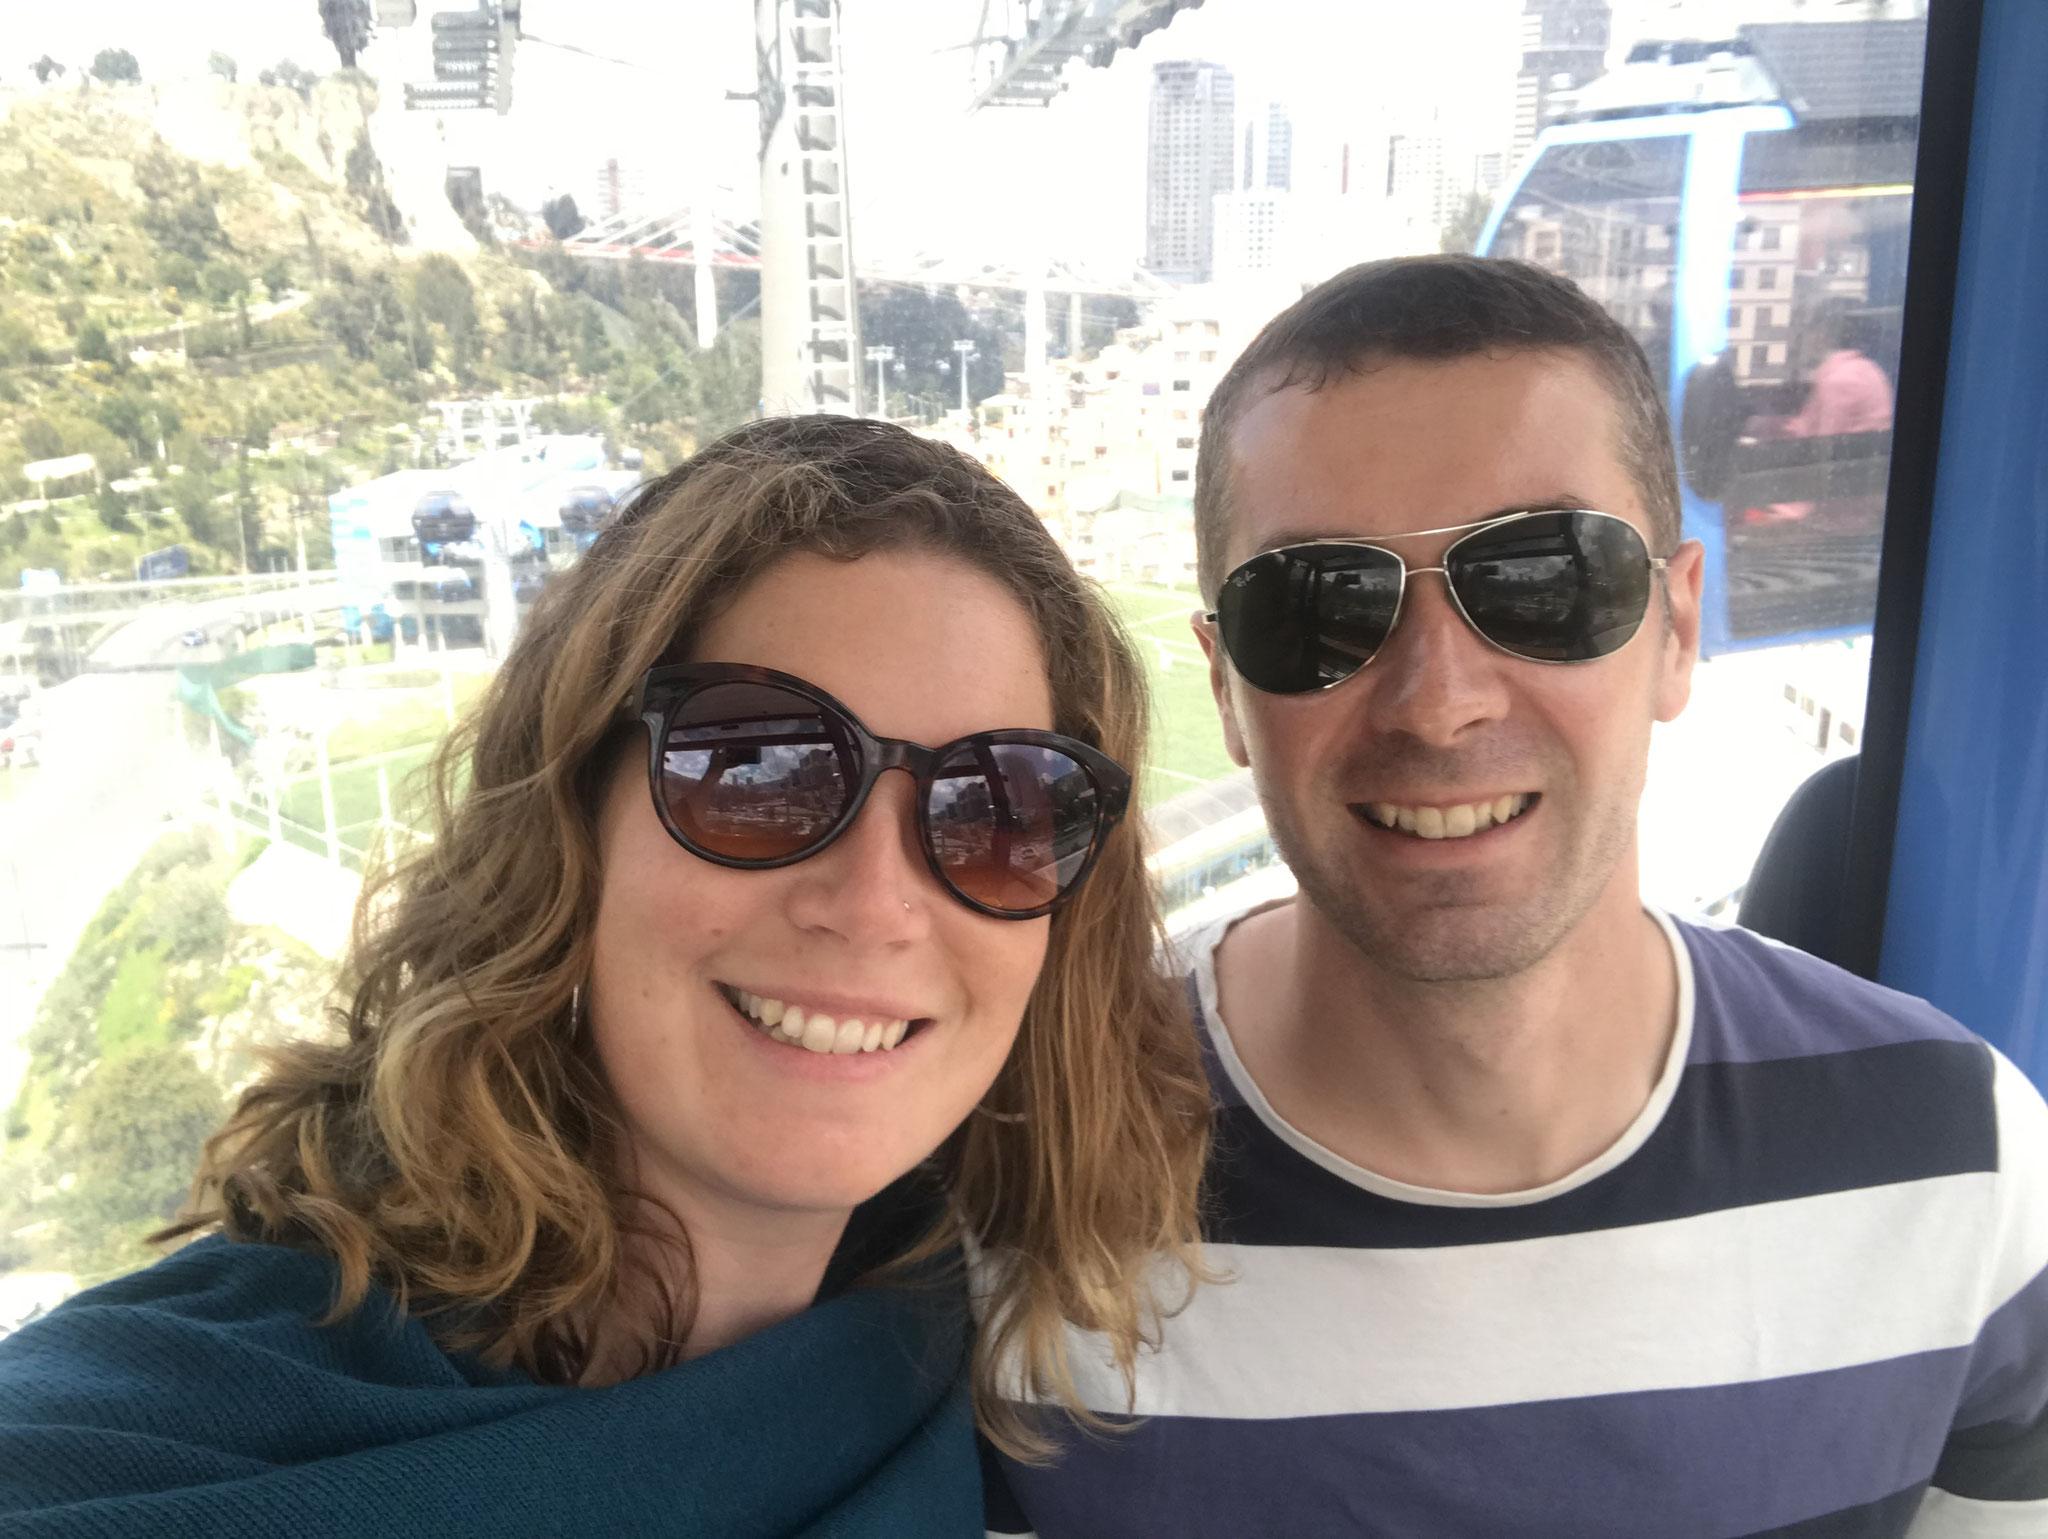 Sightseeing per Gondola